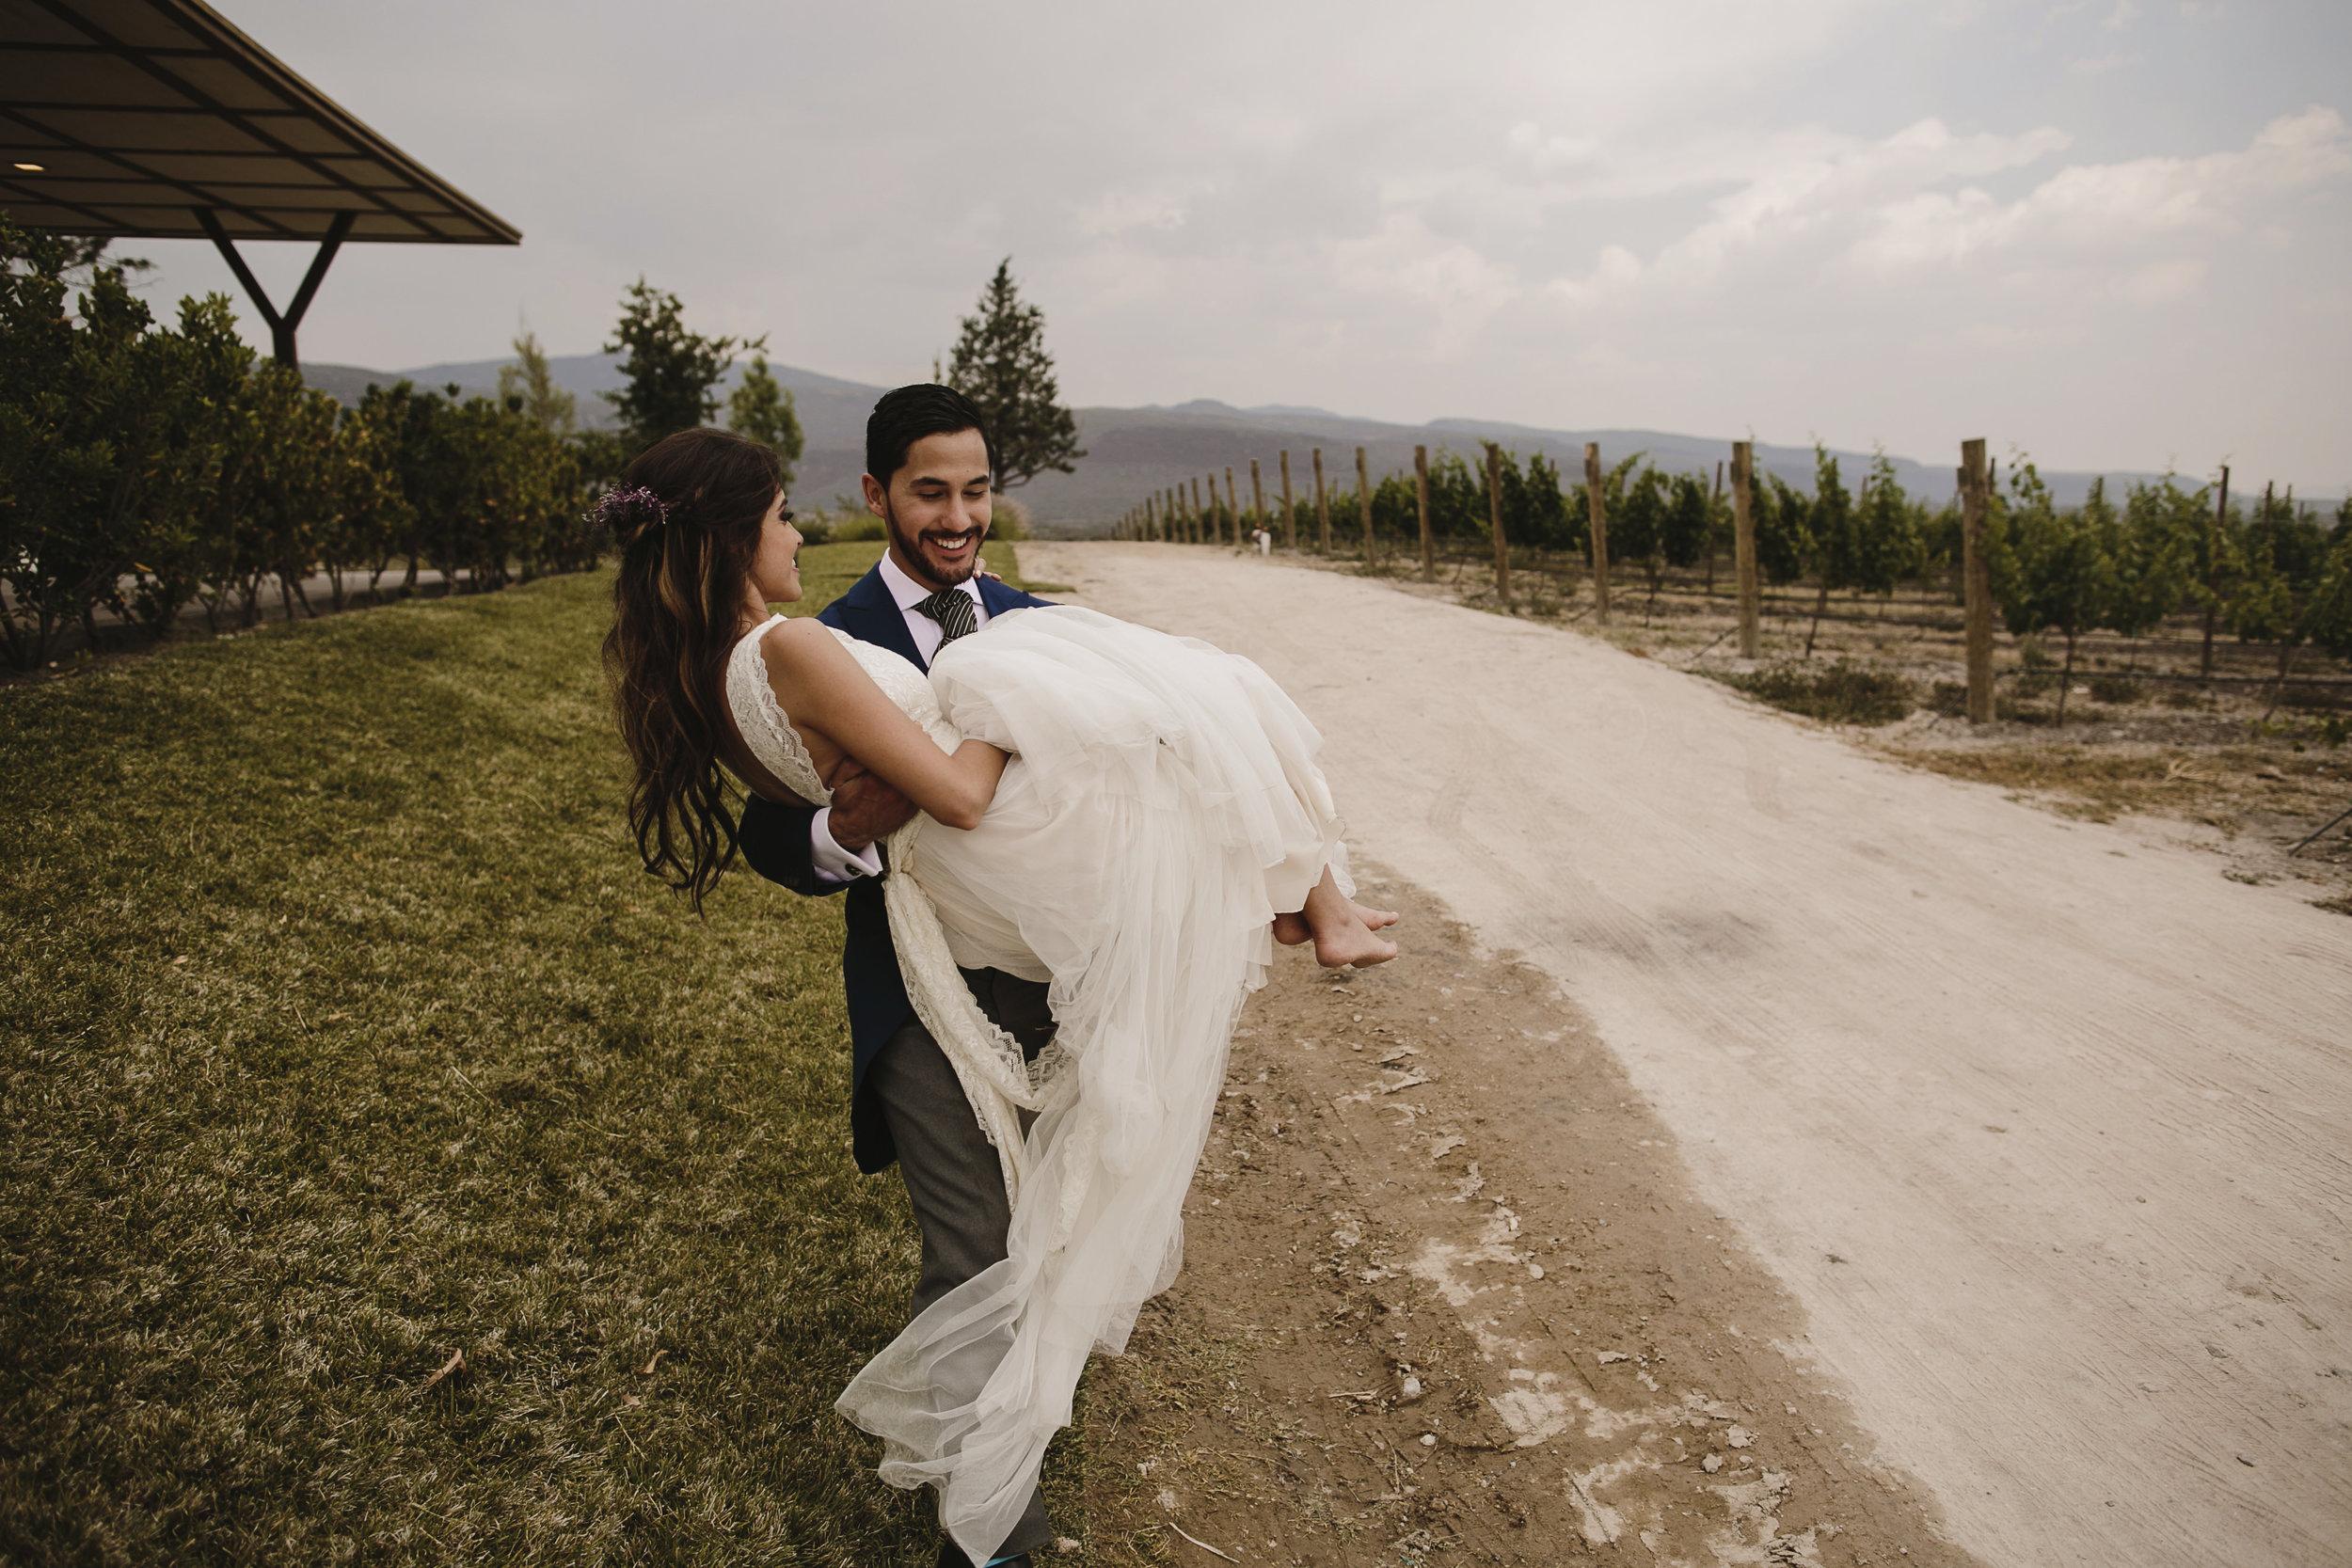 alfons_flores_destination_wedding_photography_mavi_david-1261.JPG